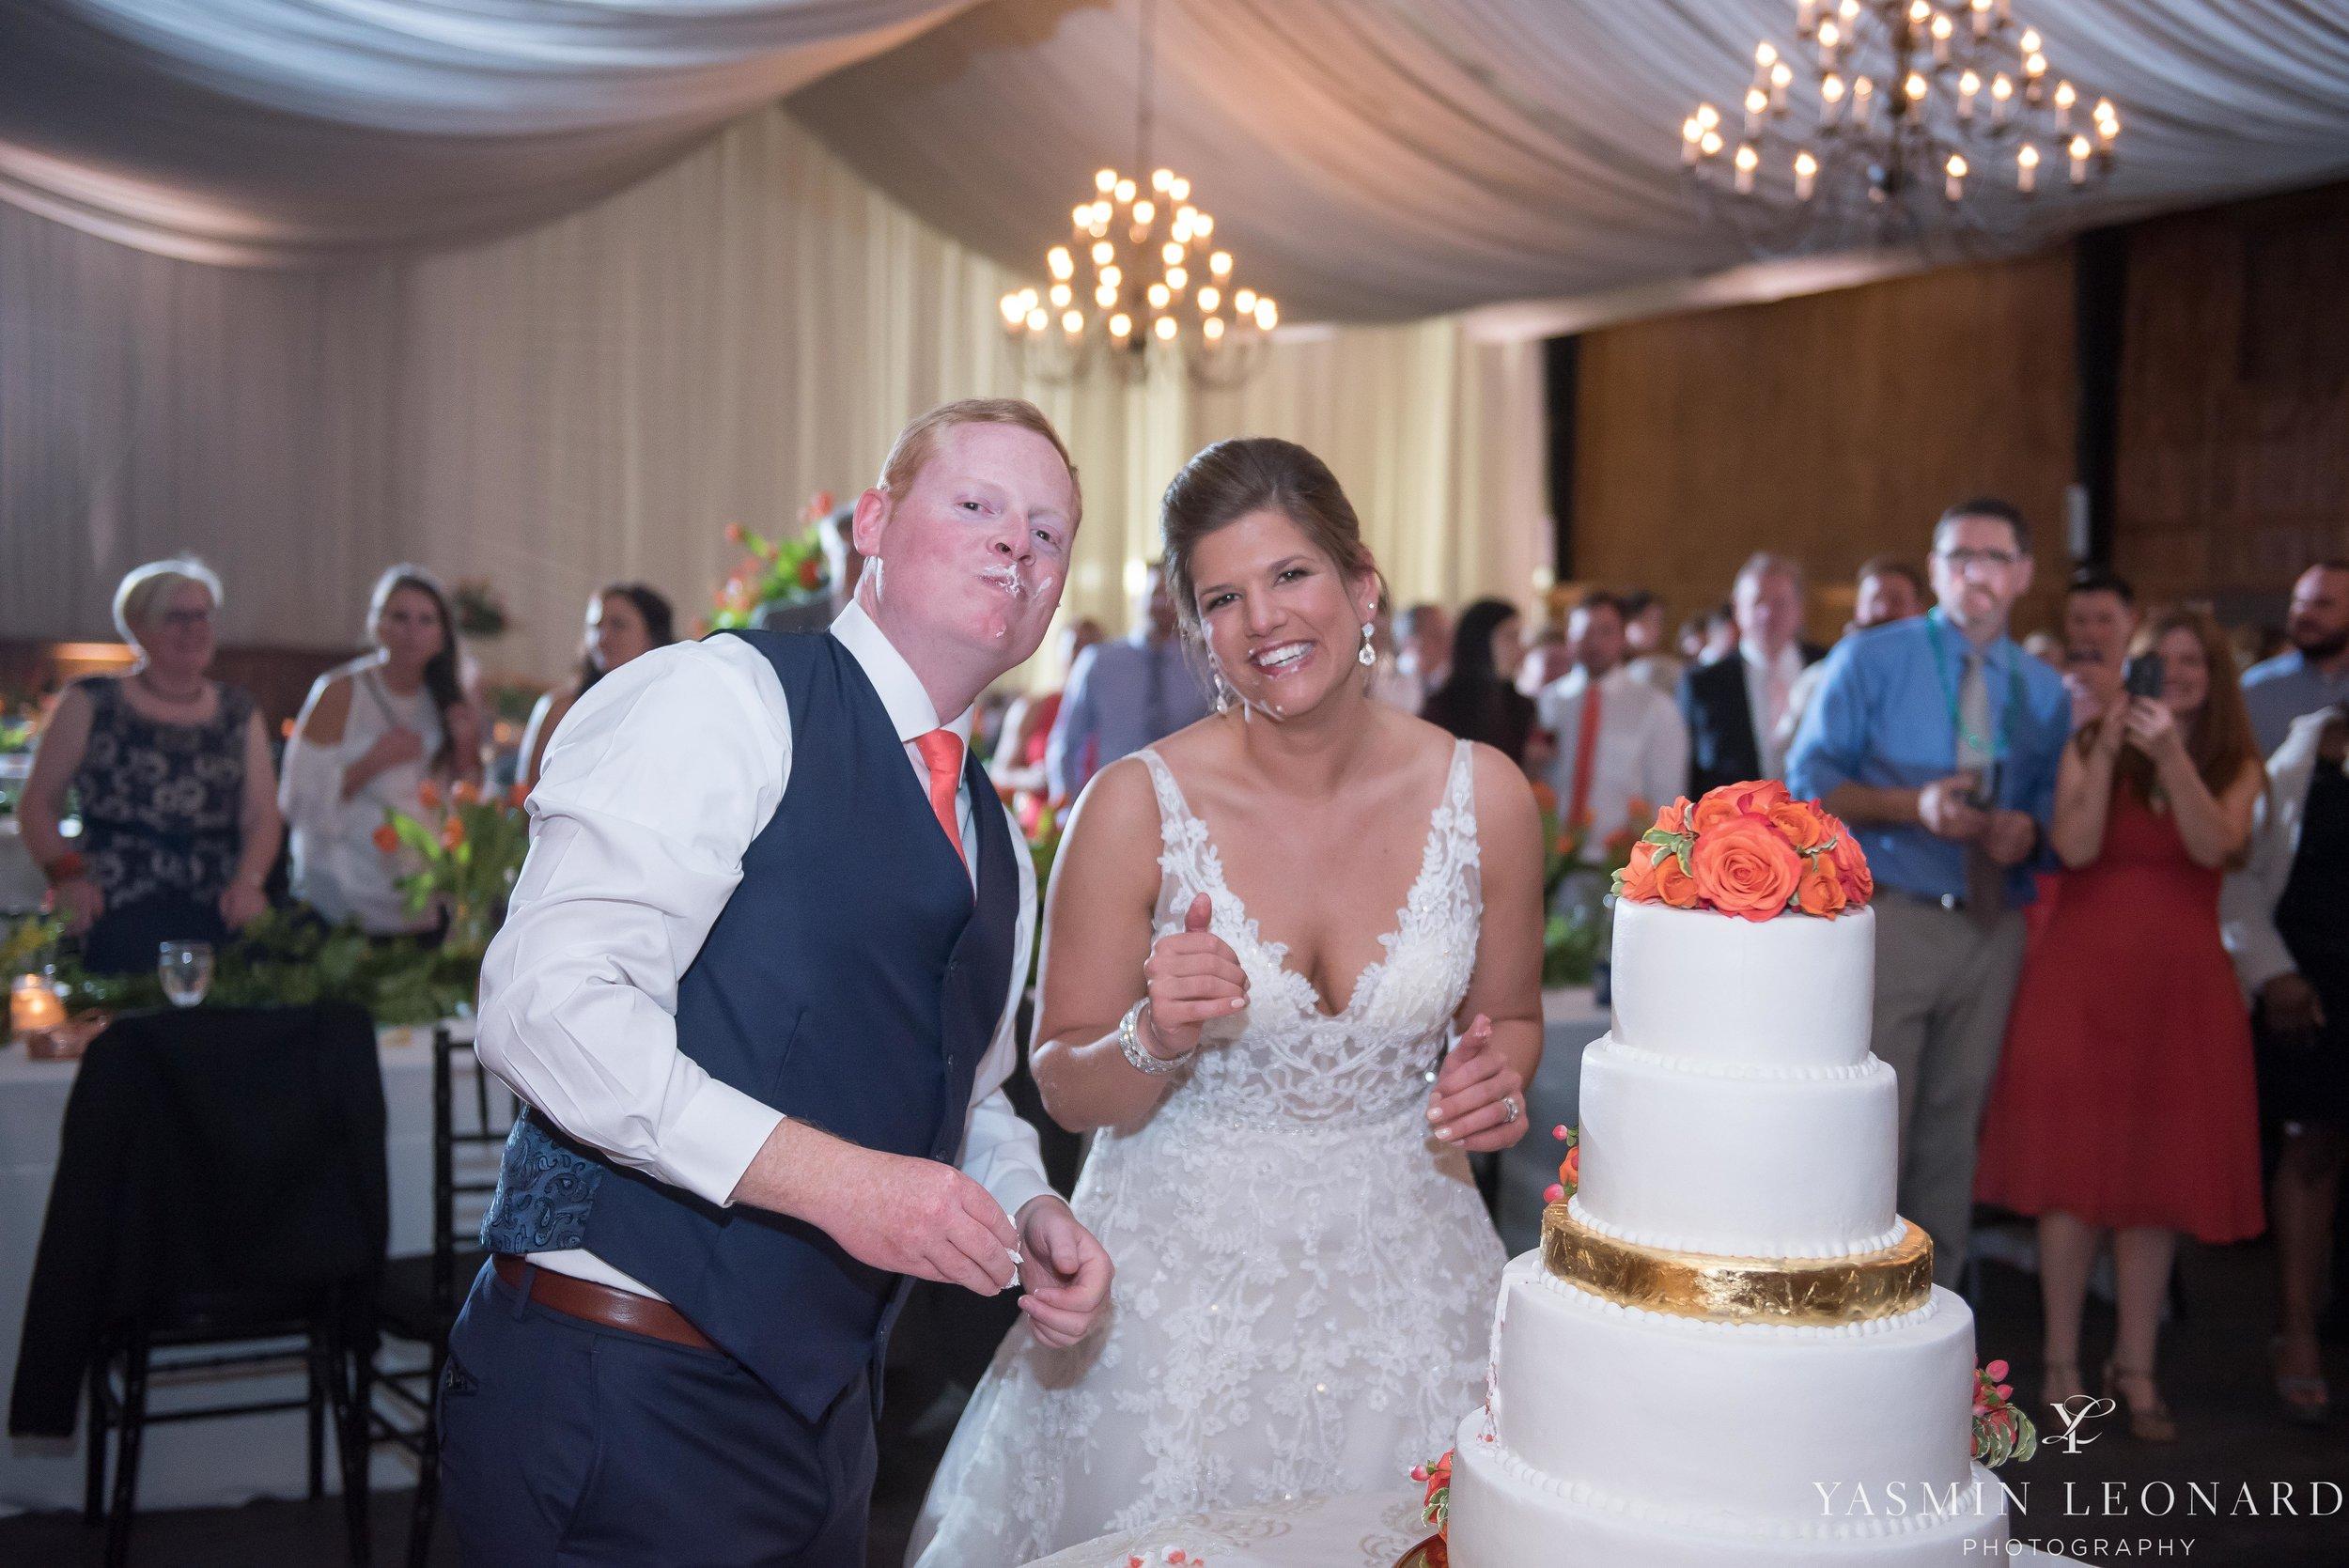 Adaumont Farm - Adaumont Farm Weddings - Trinity Weddings - NC Weddings - Yasmin Leonard Photography-83.jpg